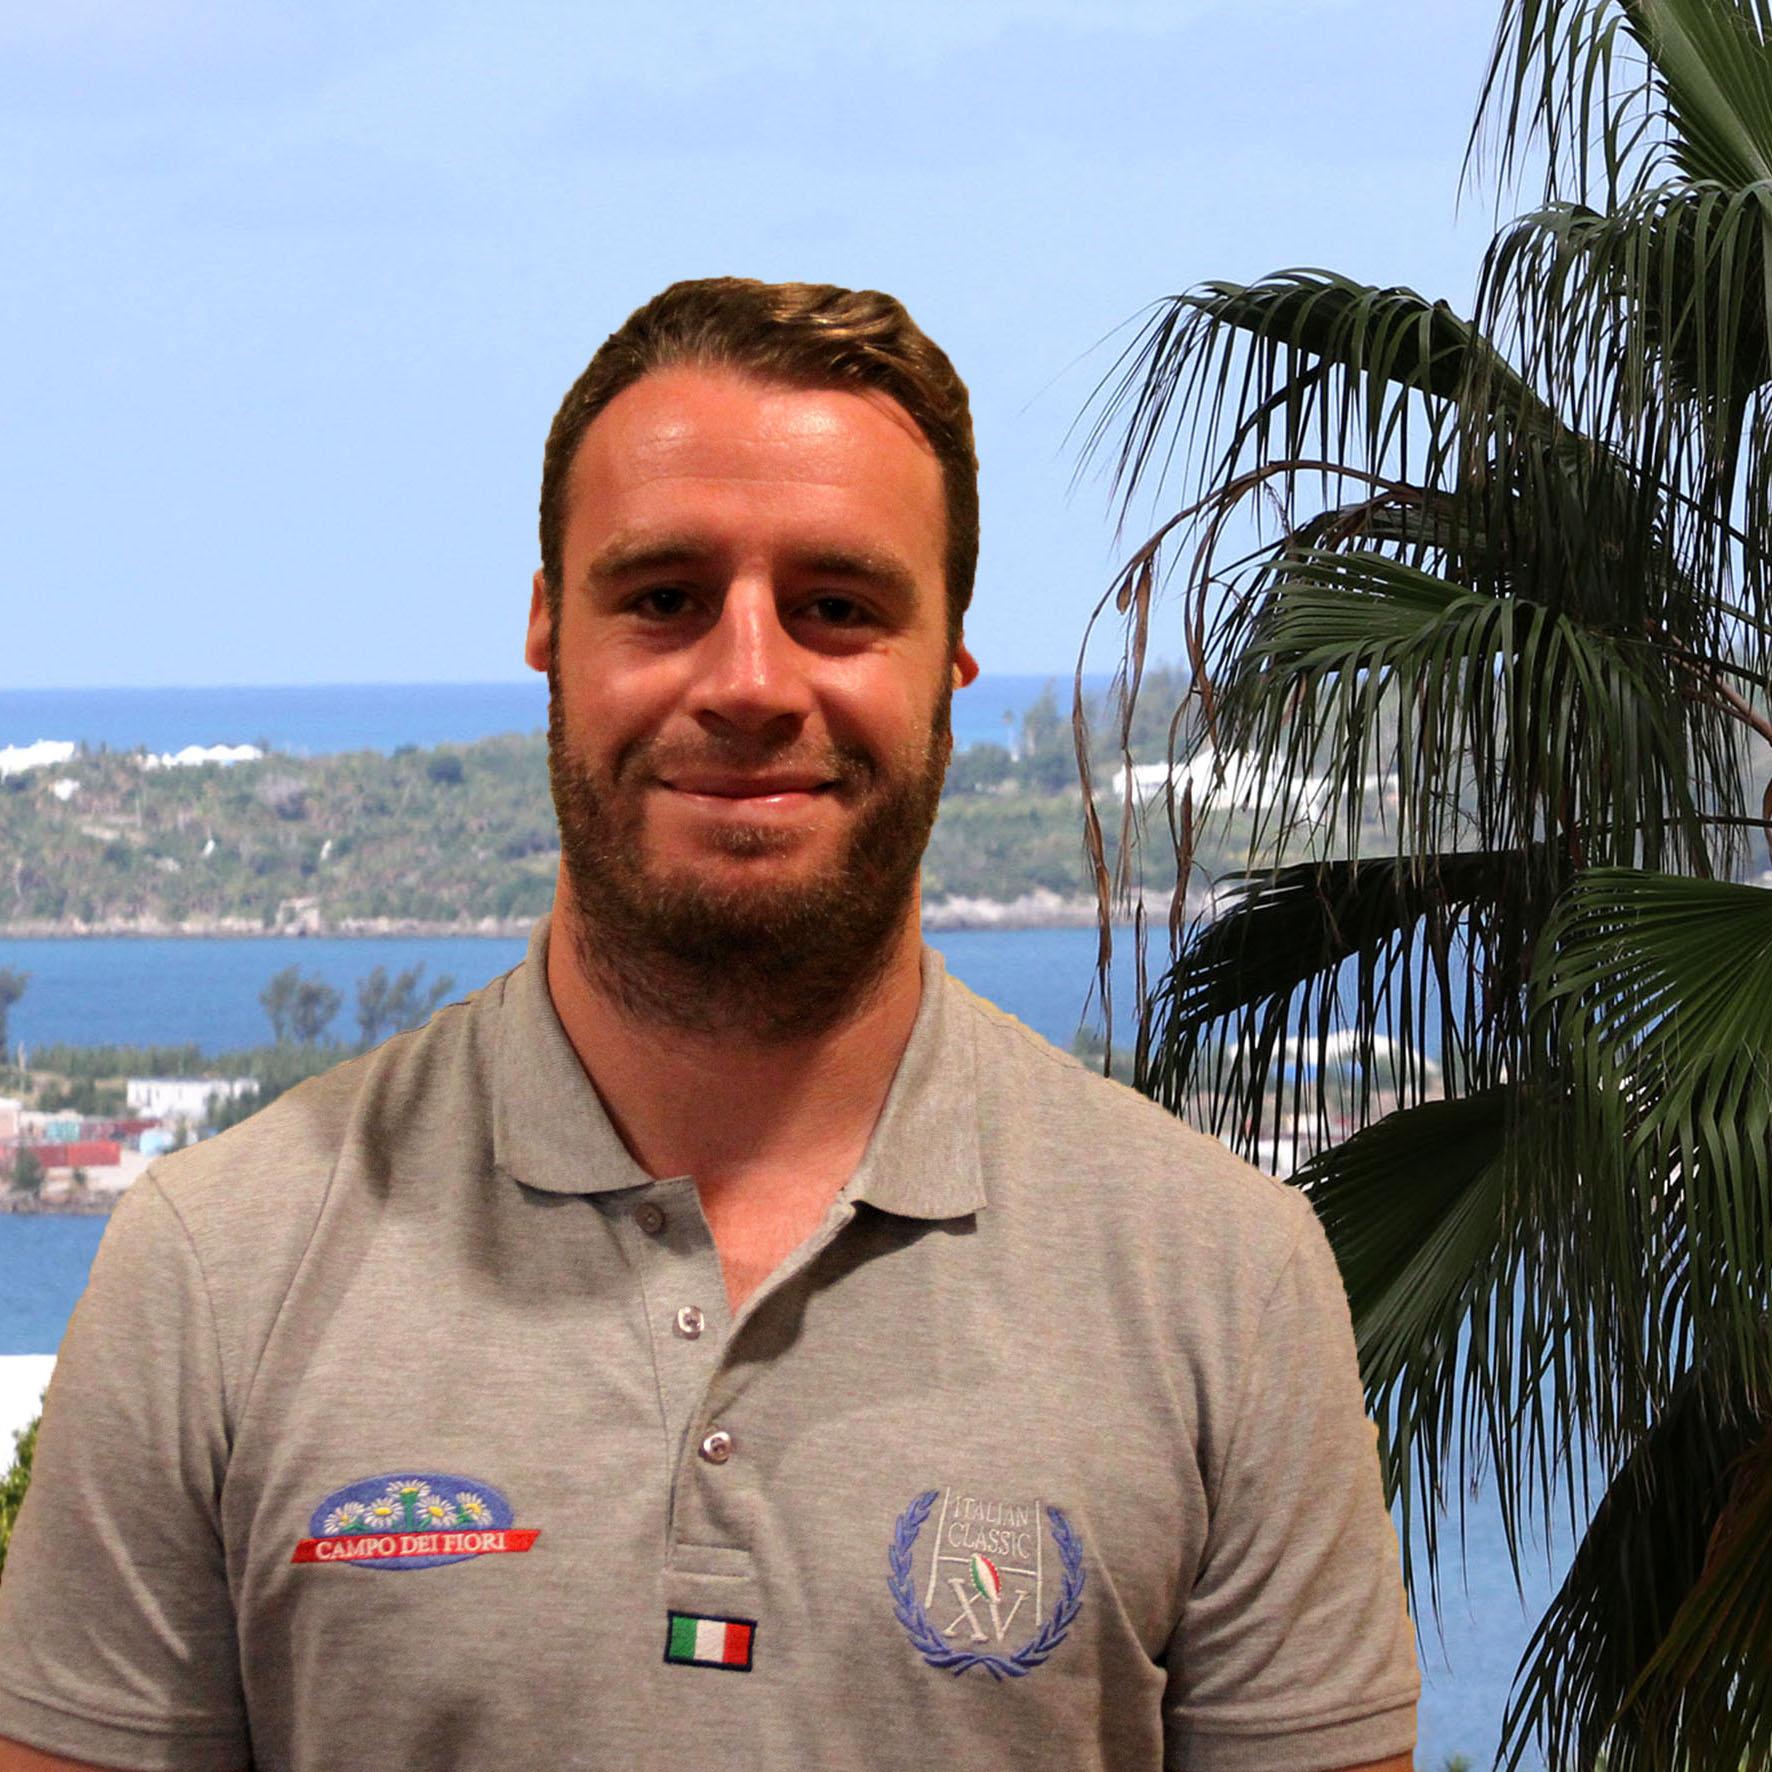 https://www.rugbyitalianclassicxv.com/wp-content/uploads/2019/04/WorldClassic2018_Bermuda_20181104_00_Barbieri_ph_Turchetto.jpg